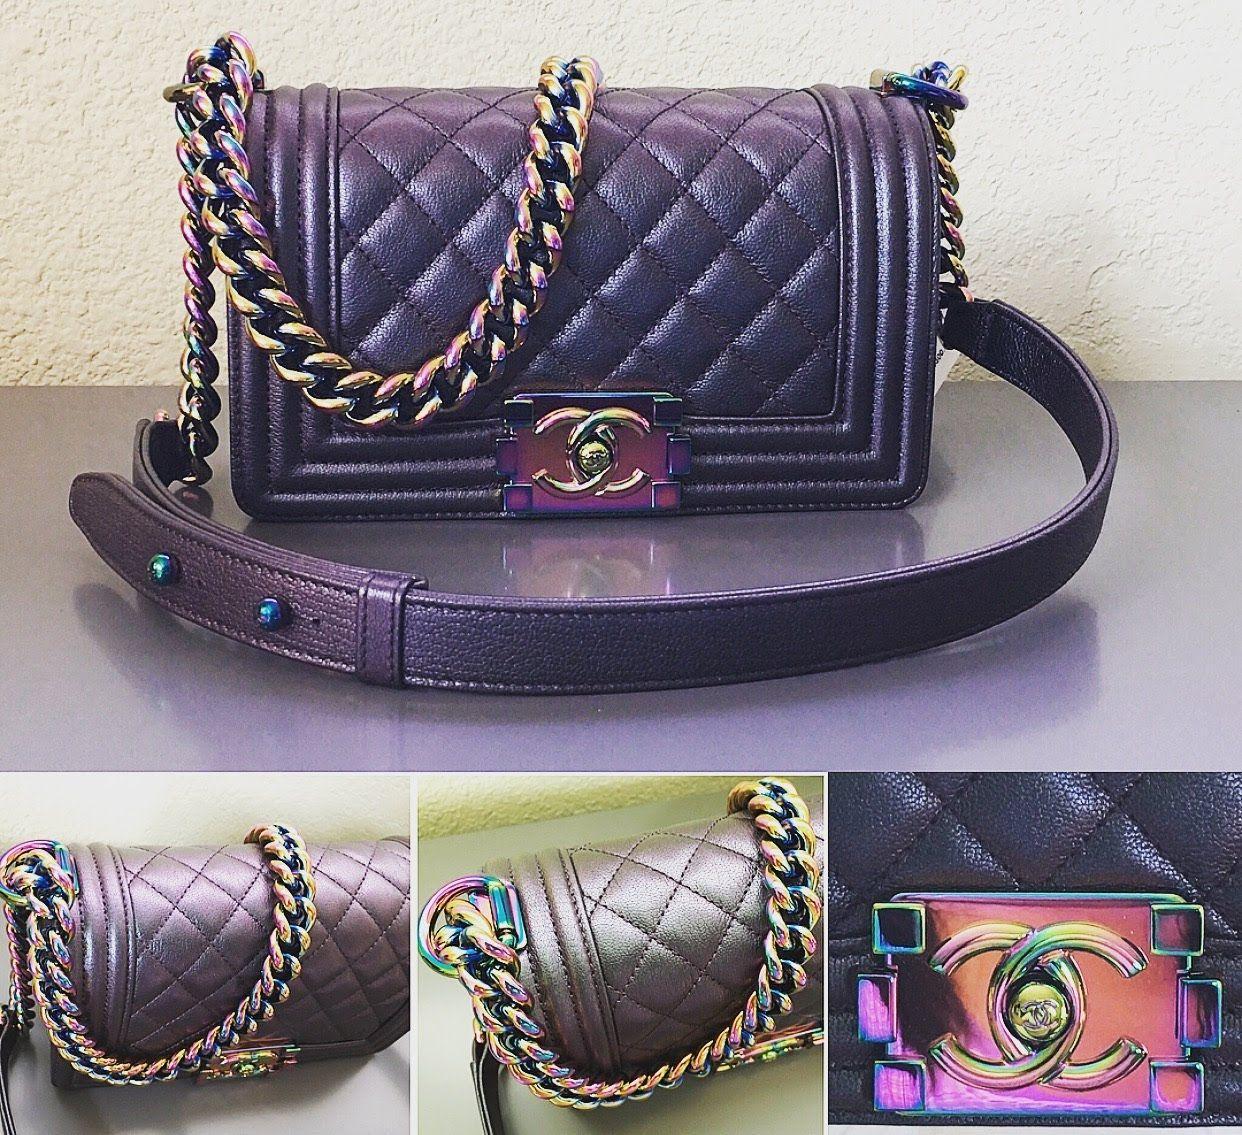 03213cecd1 chanel iridescent boy bag replica - Google Search